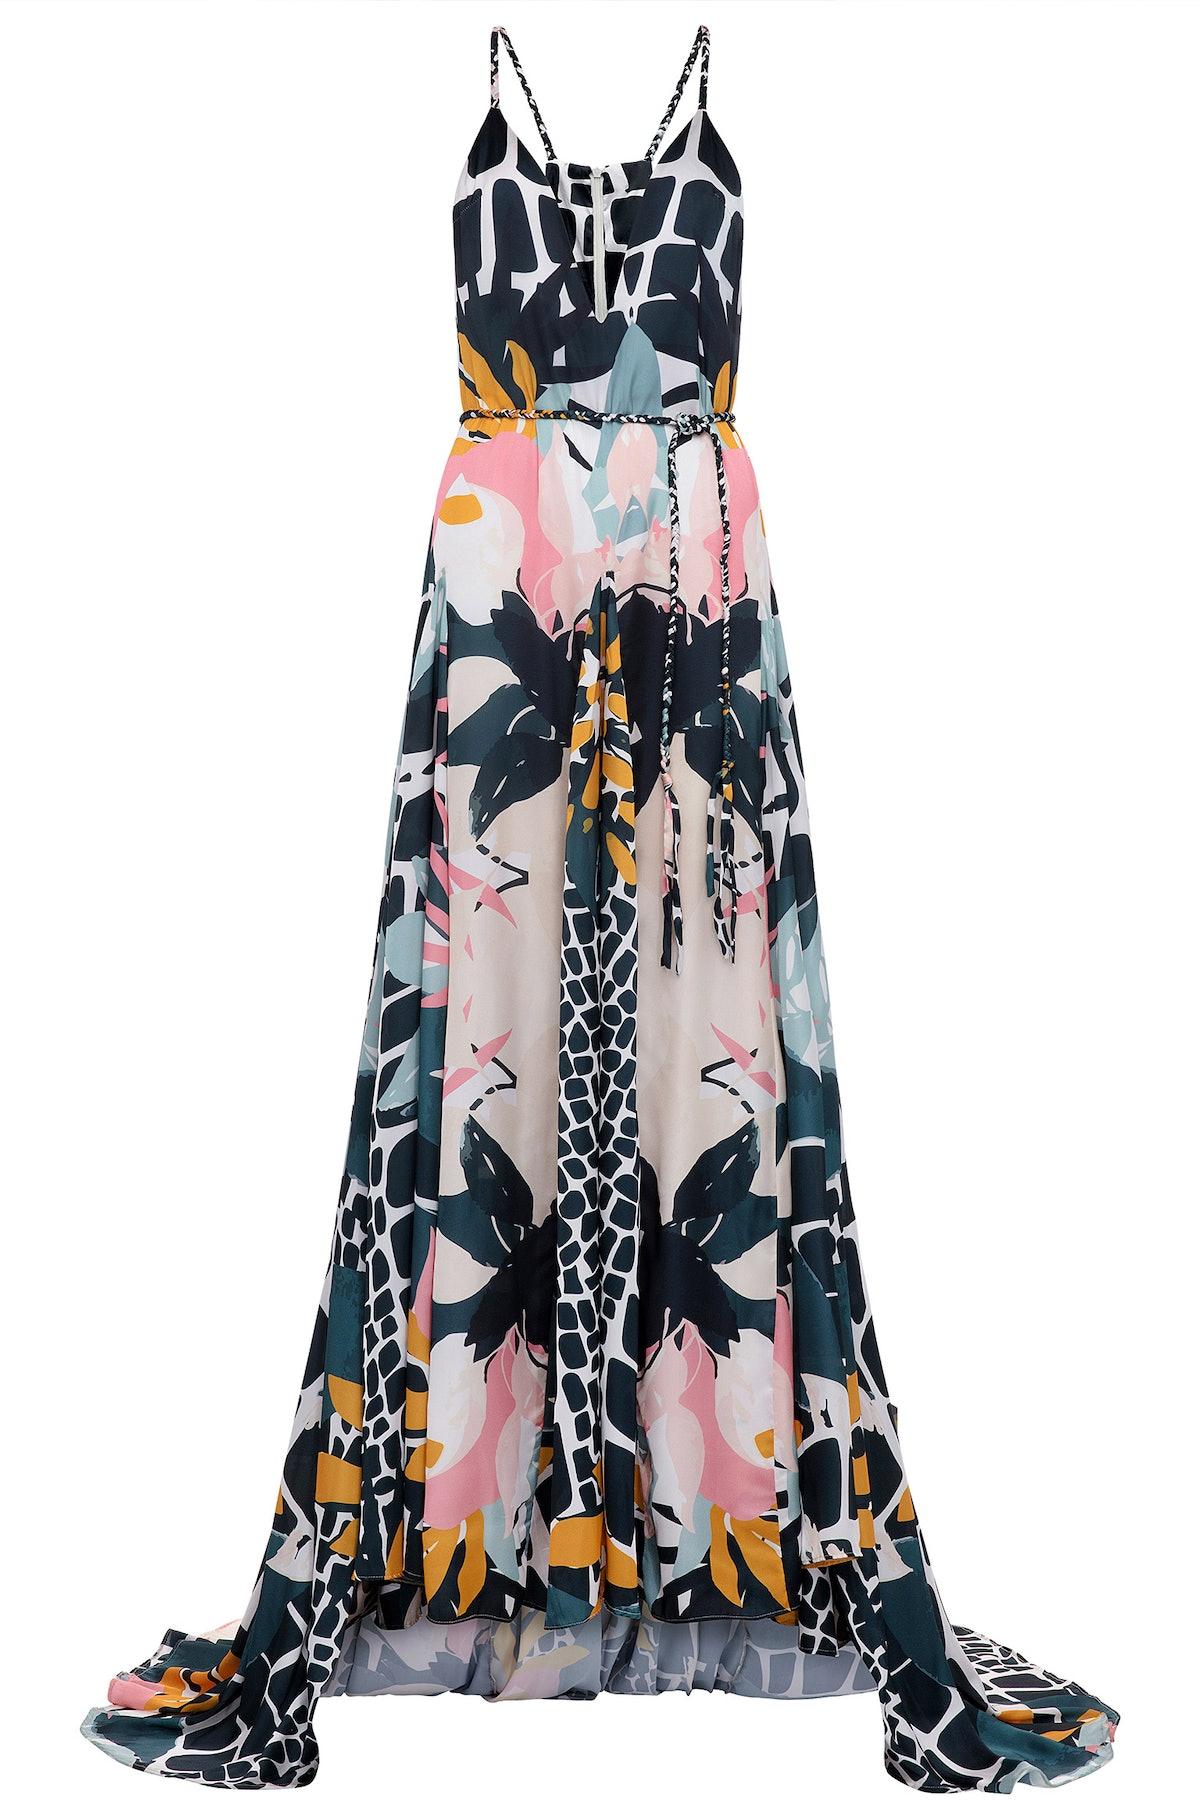 Manzanilla Breeze maxi dress from Shoma the Label.